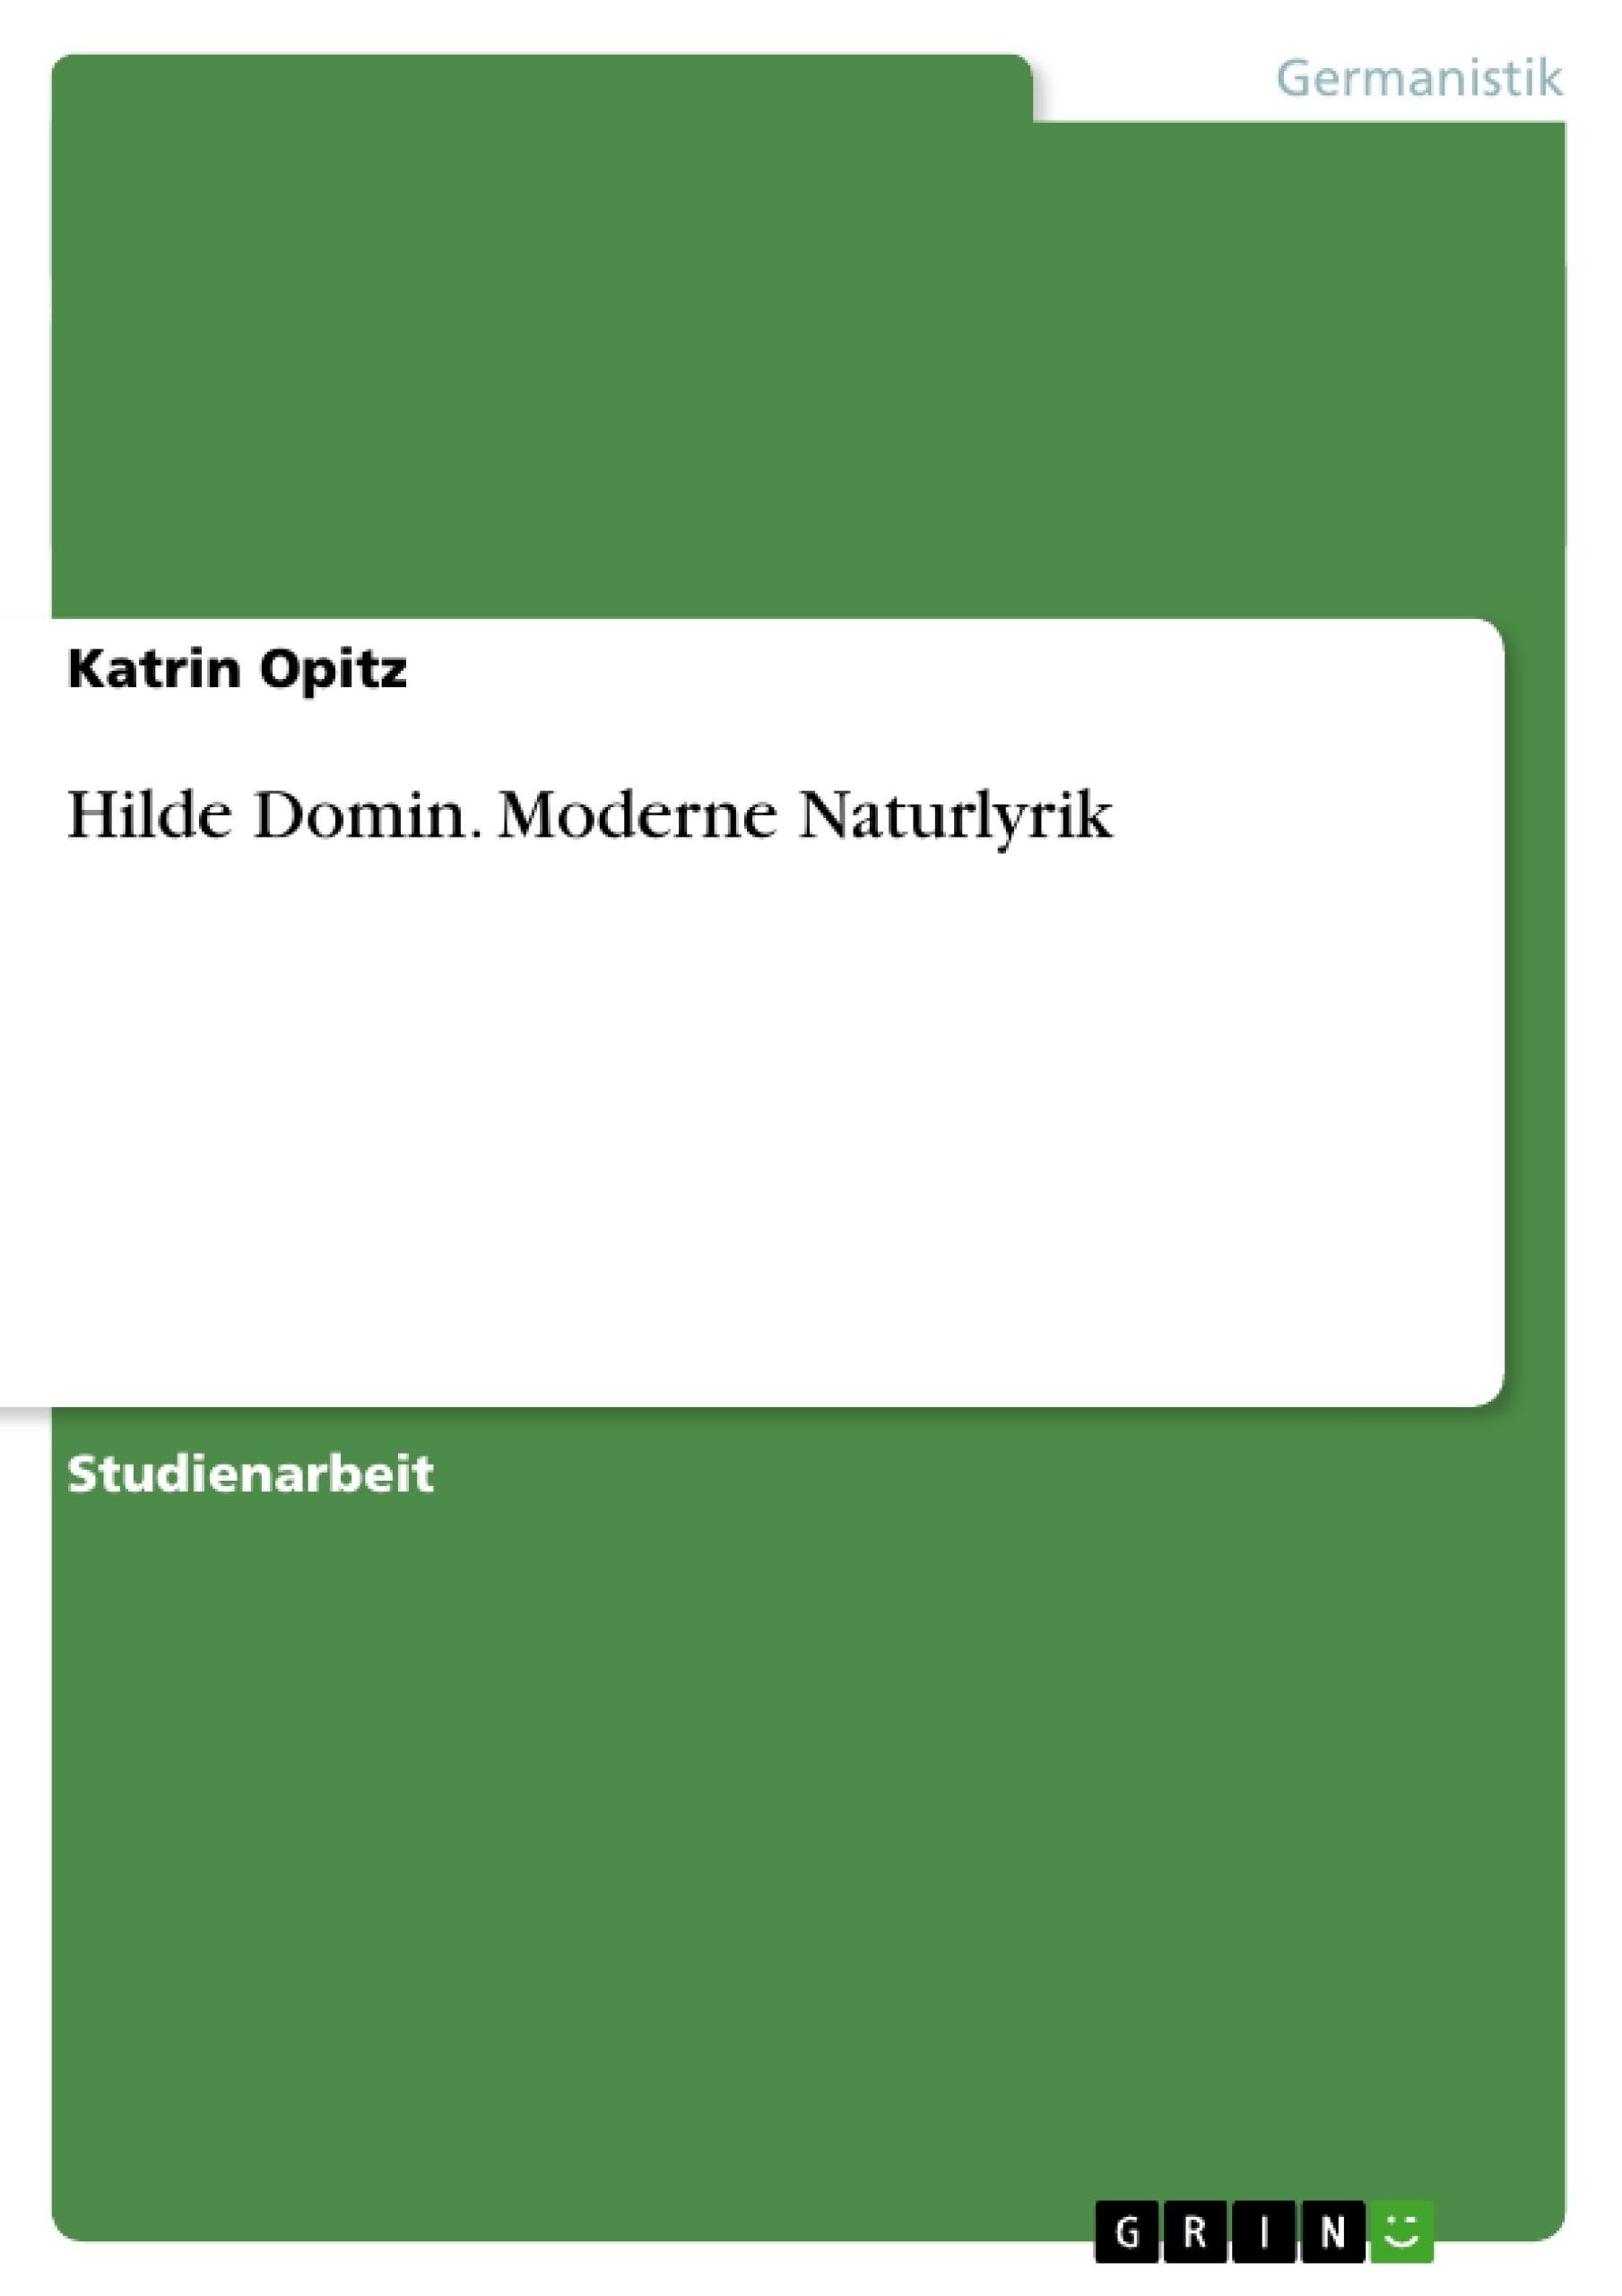 Titel: Hilde Domin. Moderne Naturlyrik